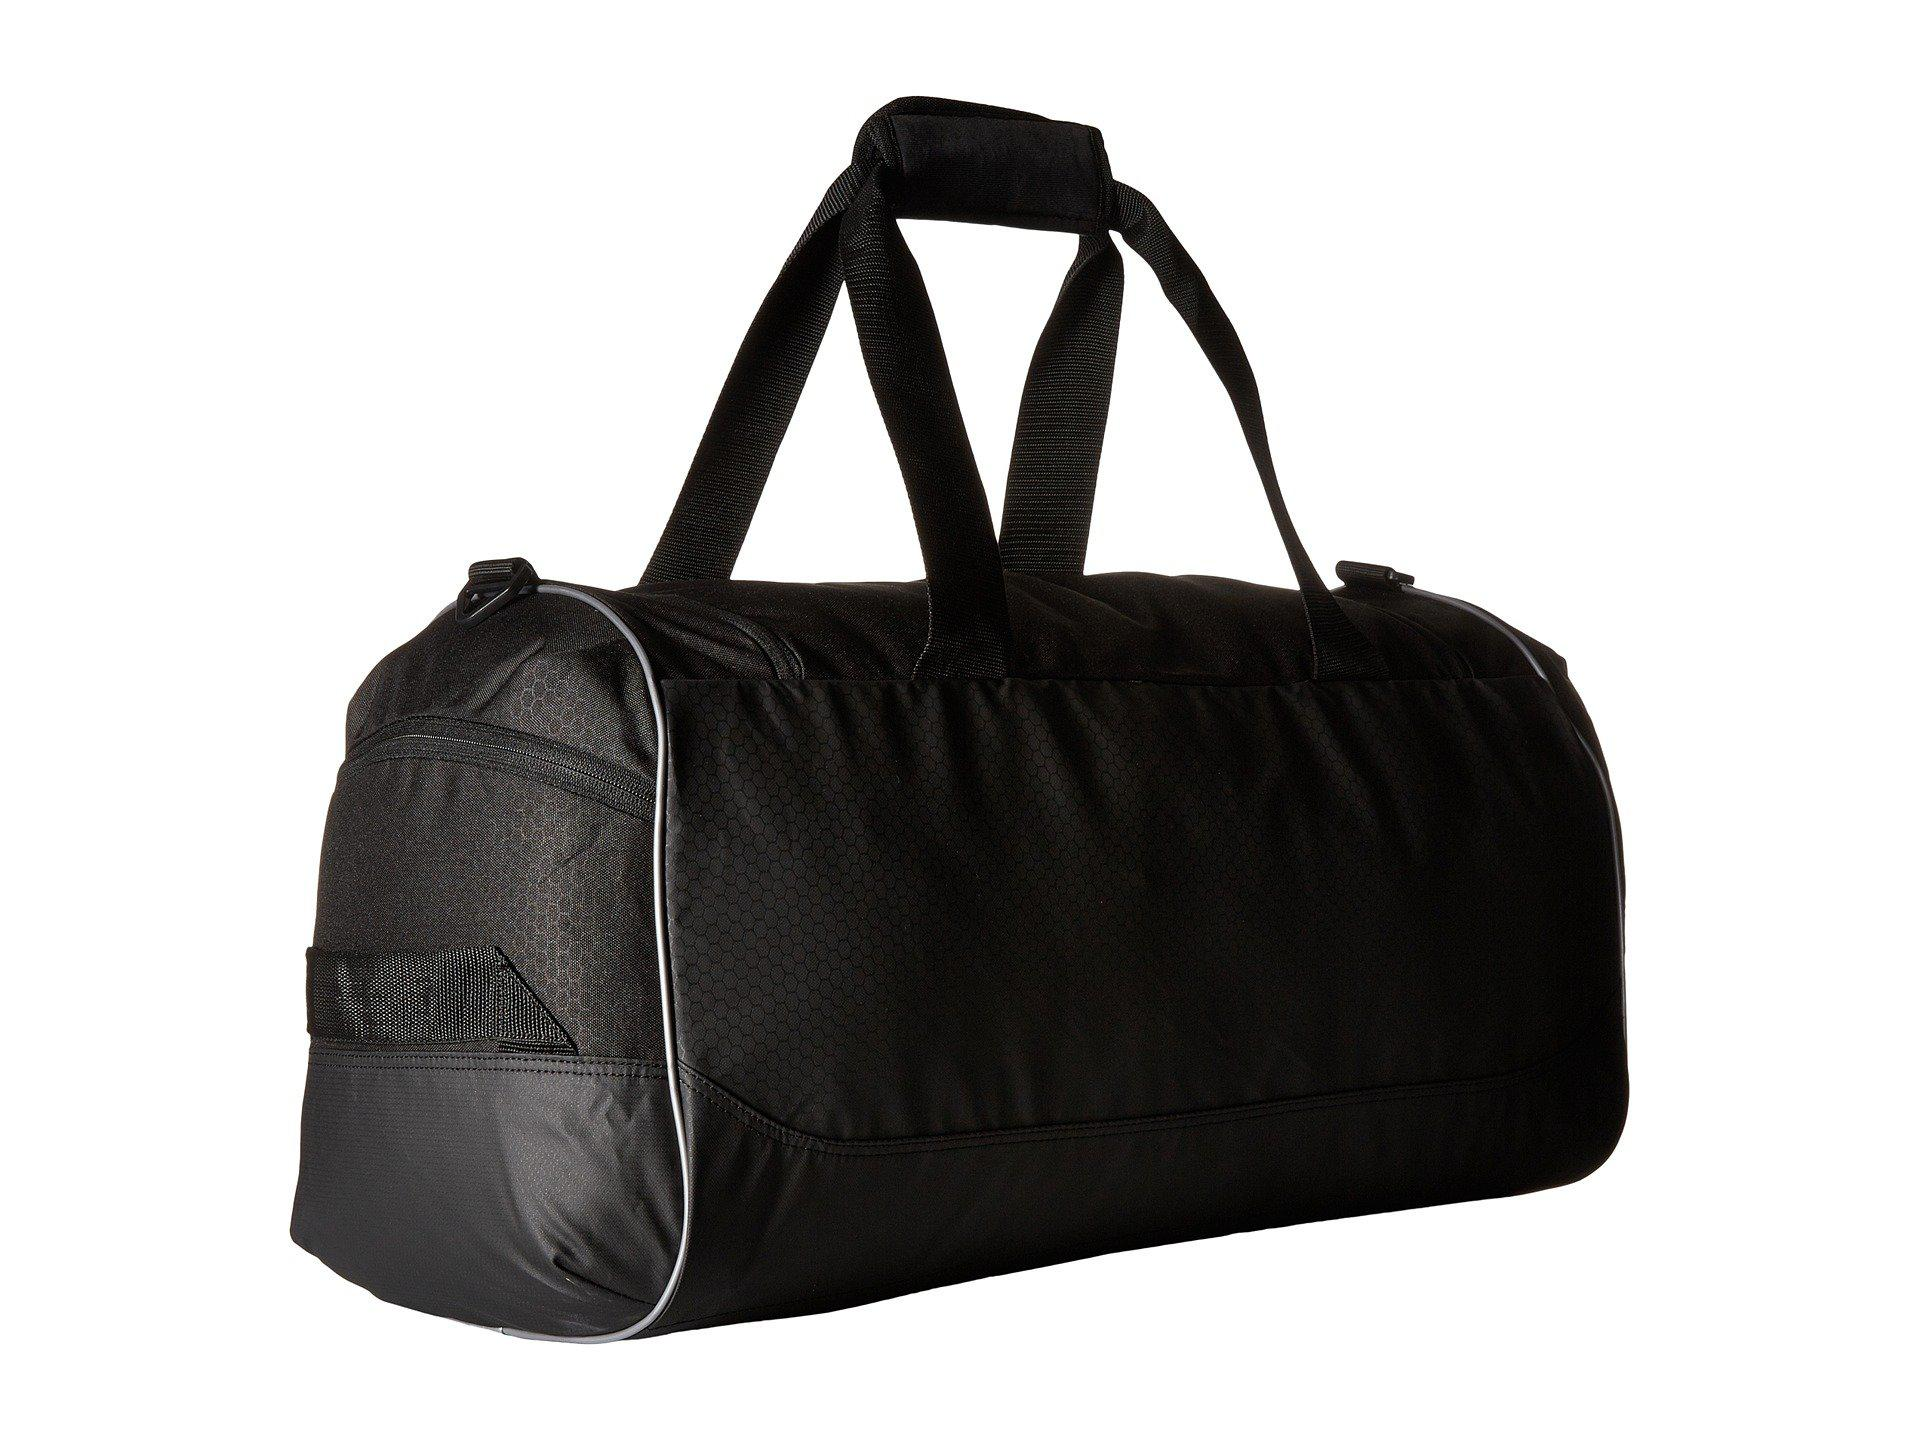 b3c684b826 Adidas - Gray Team Issue Medium Duffel (black) Duffel Bags for Men - Lyst.  View fullscreen